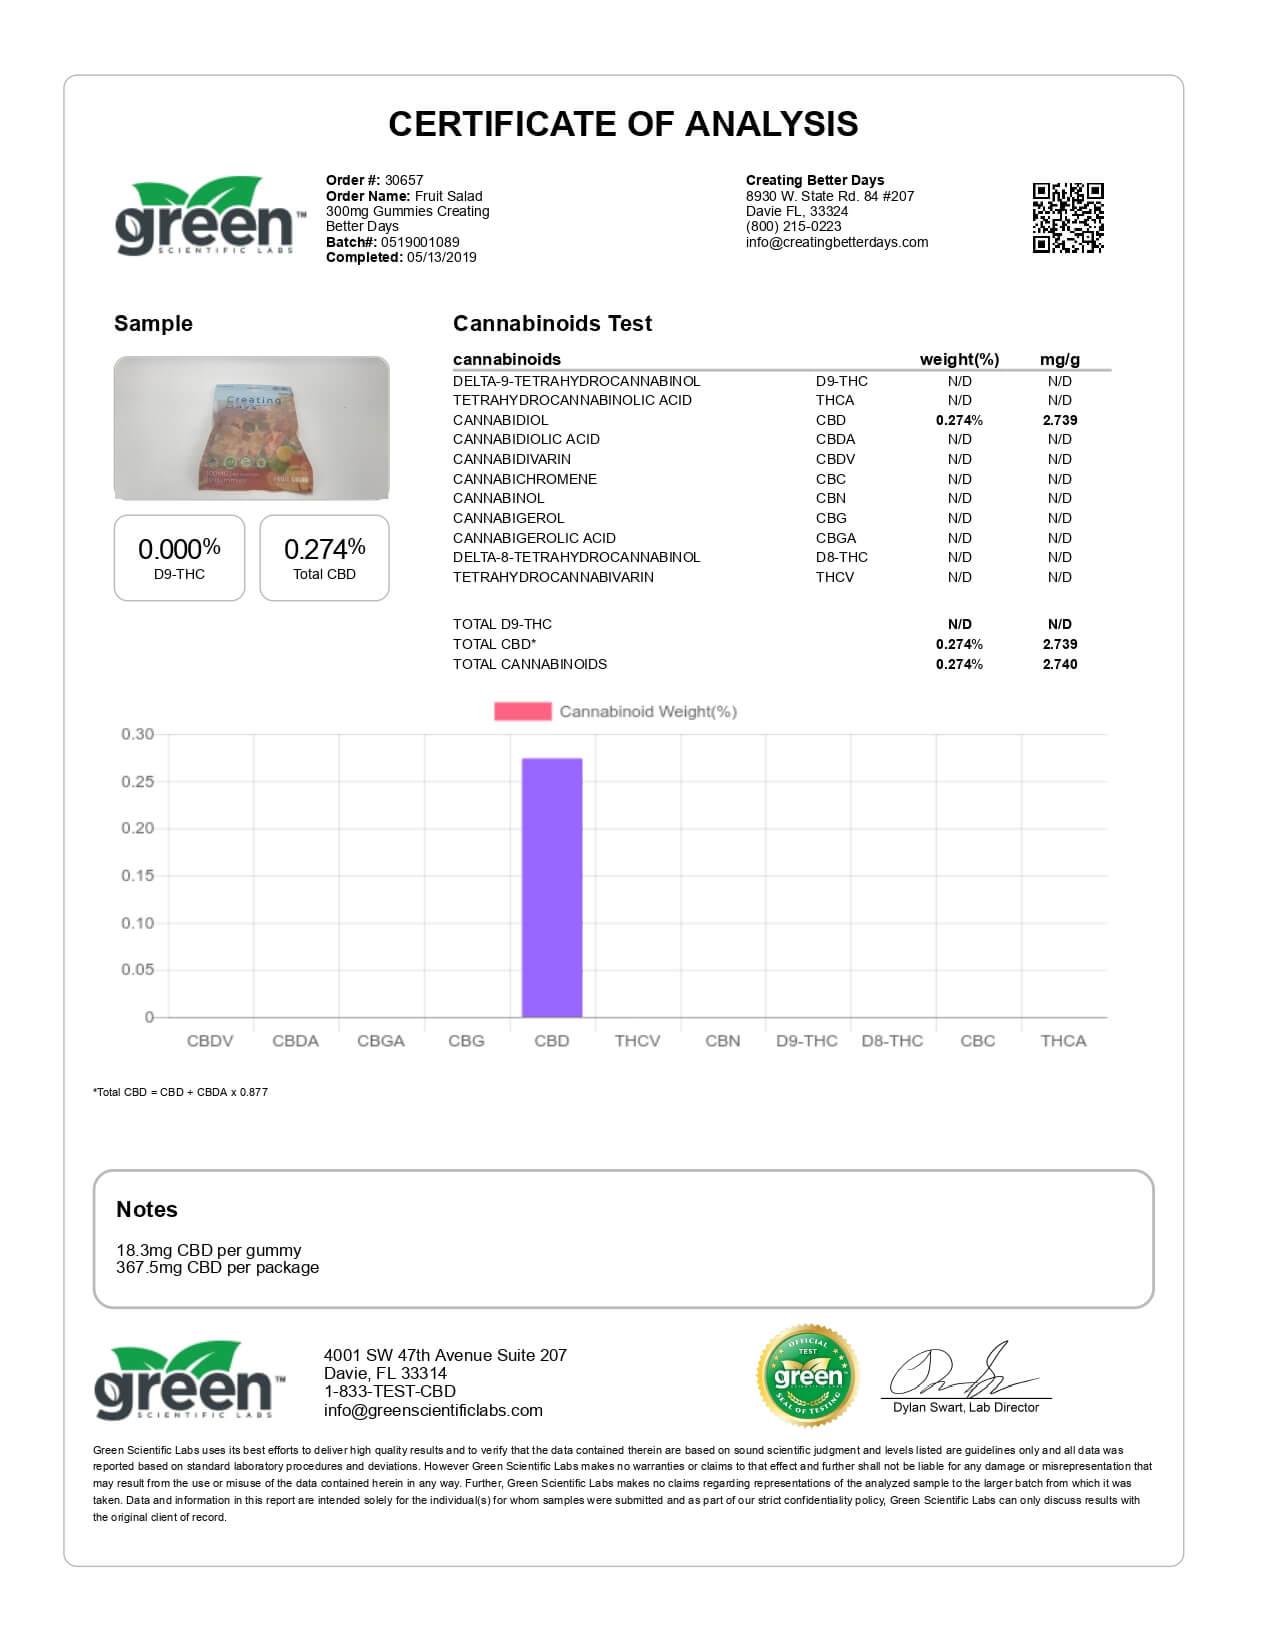 Creating Better Days CBD Edible Fruit Salad Gummies 20pc 15mg Lab Report